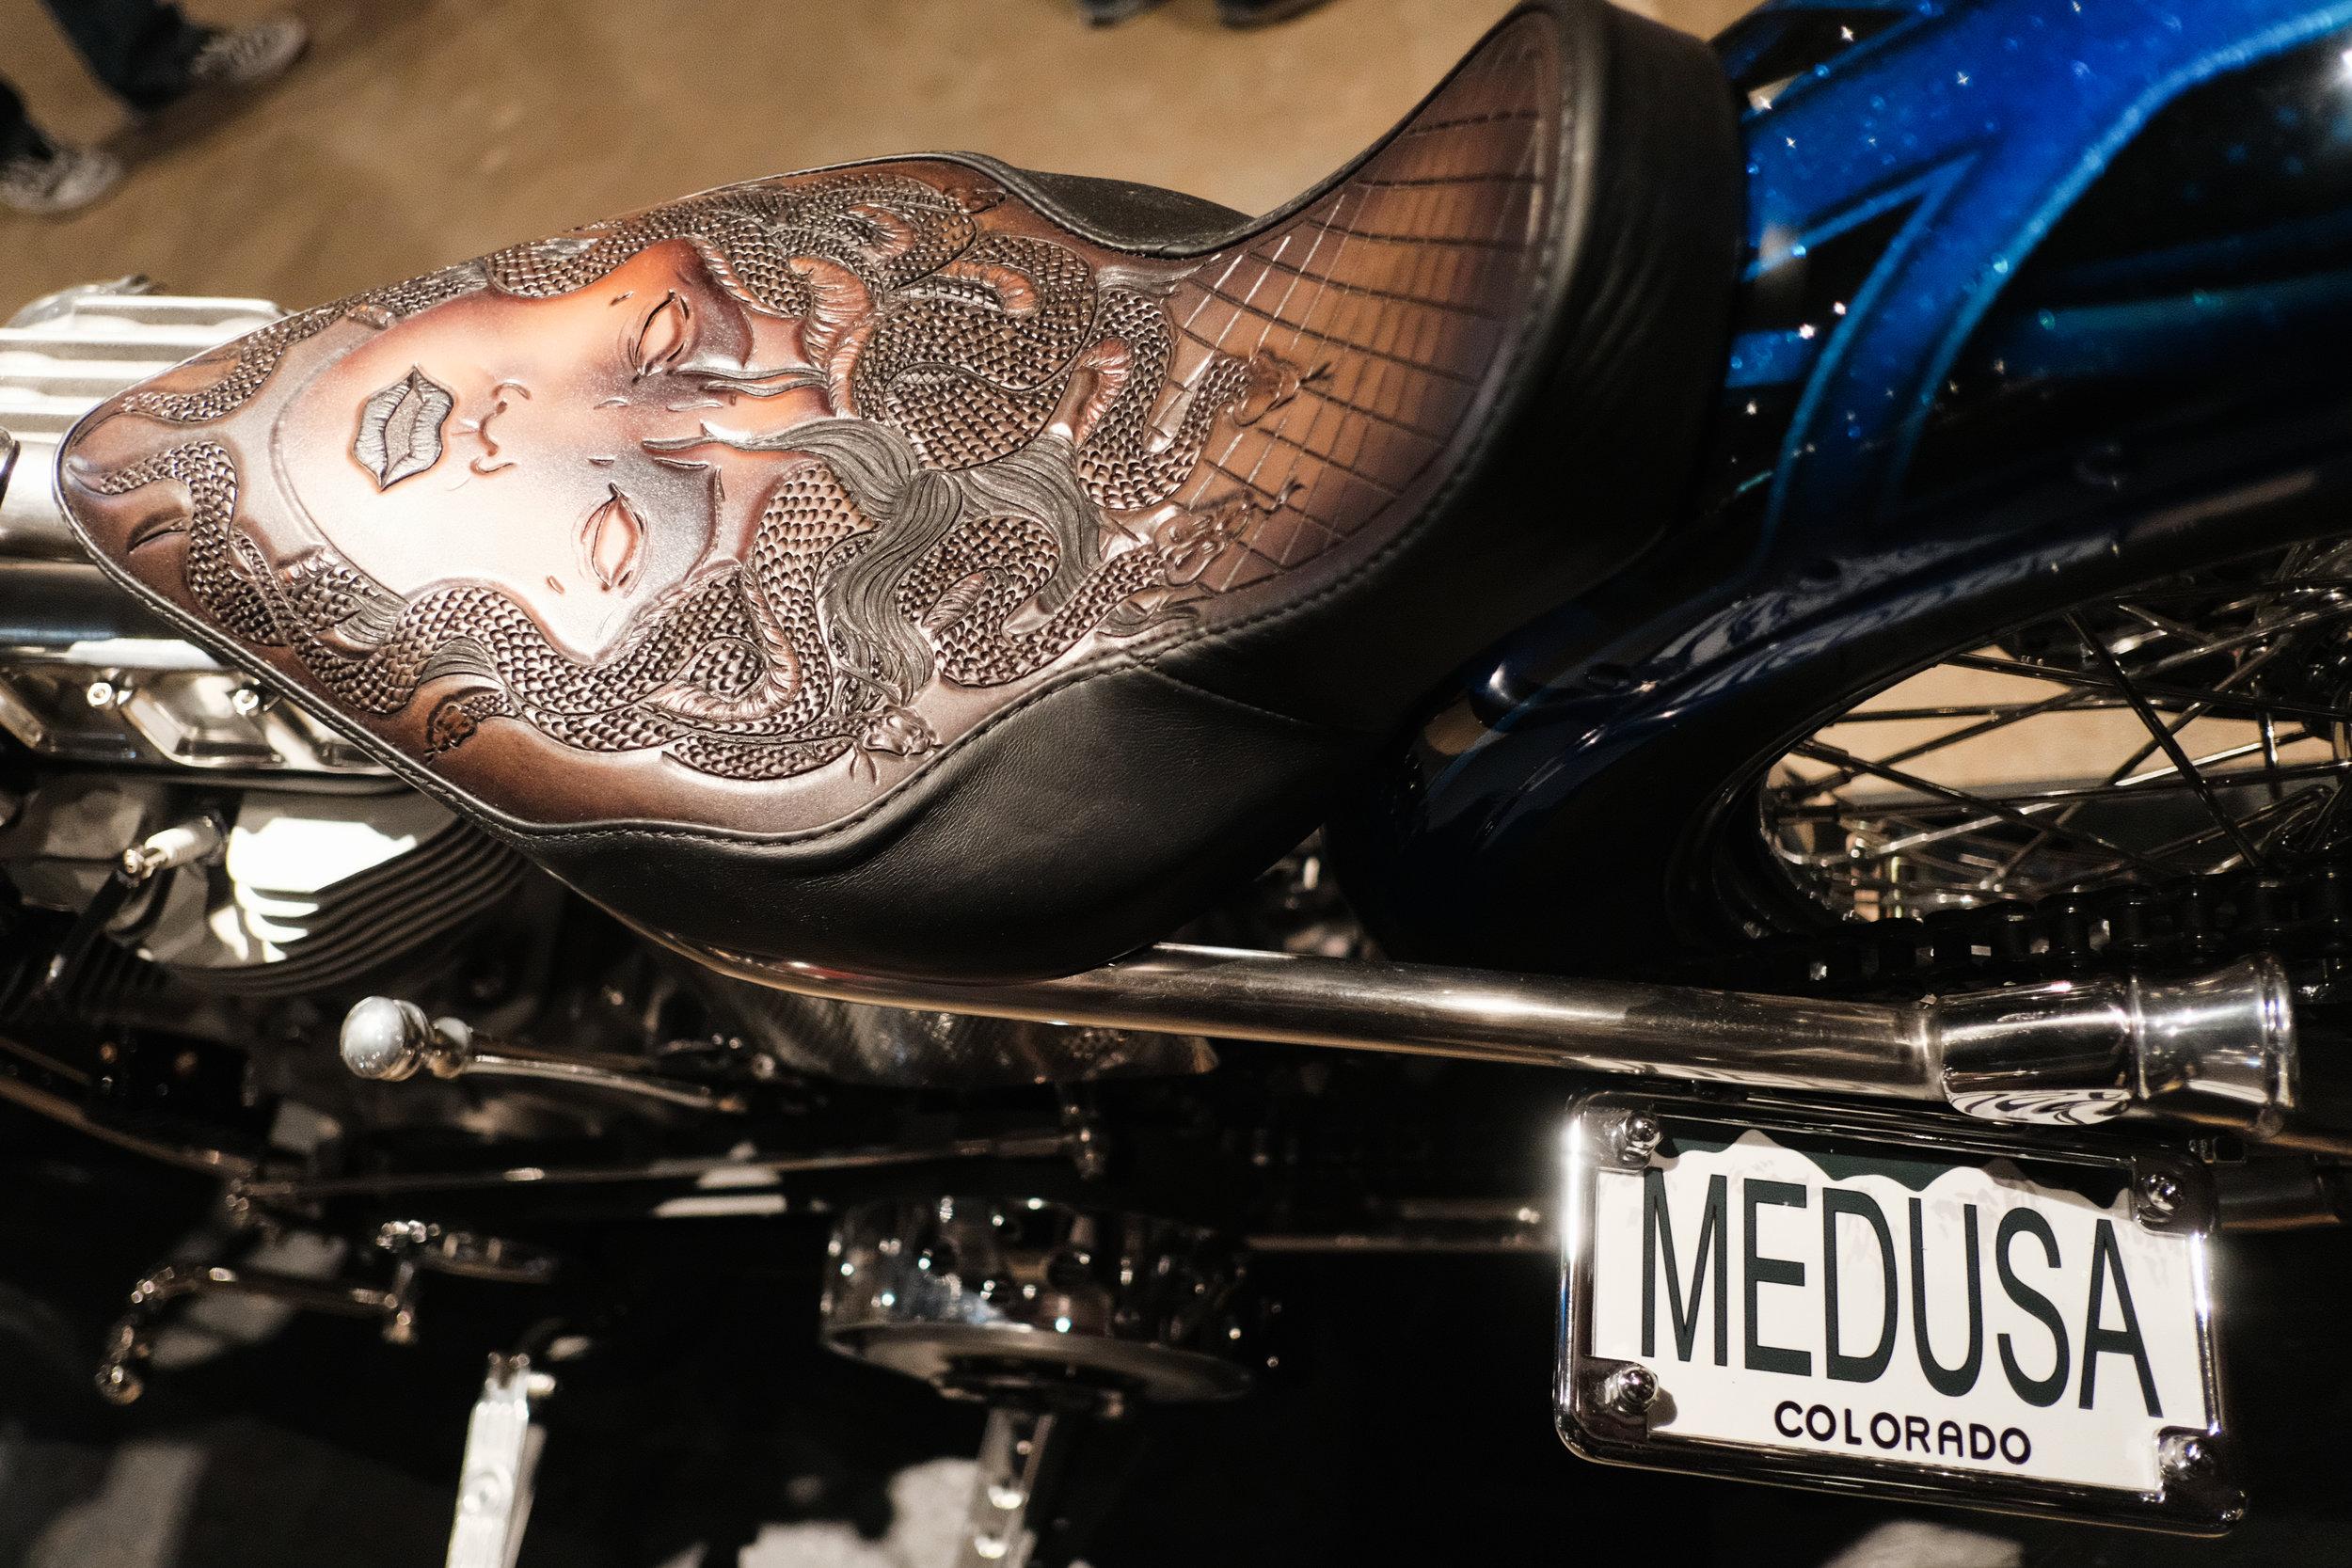 Handbuilt-Motorcycle-Show-2017-8439.jpg